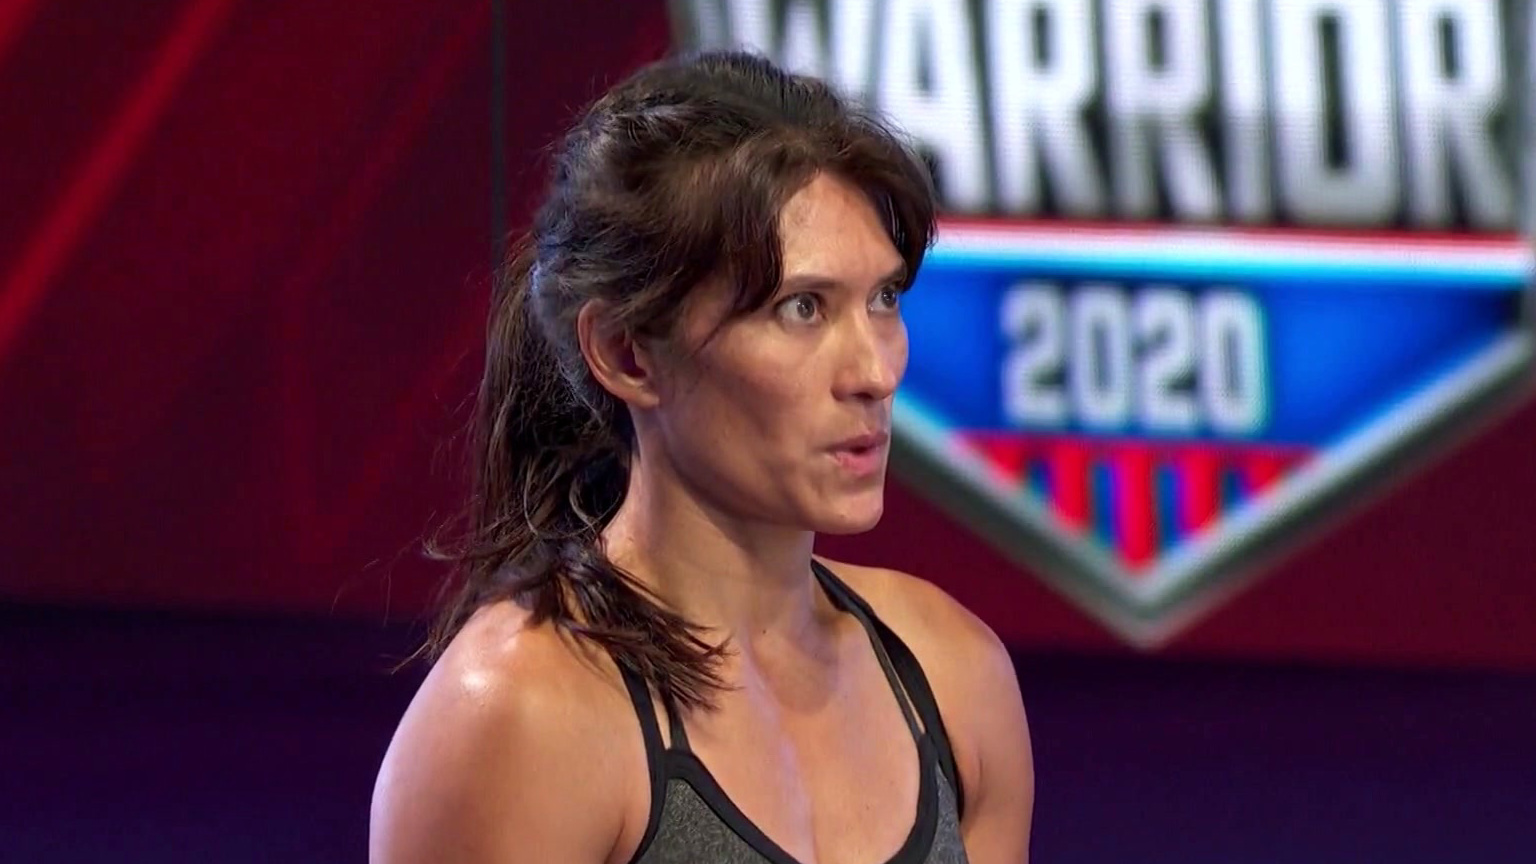 American Ninja Warrior: Sandy Zimmerman Puts Everything Into Her Run